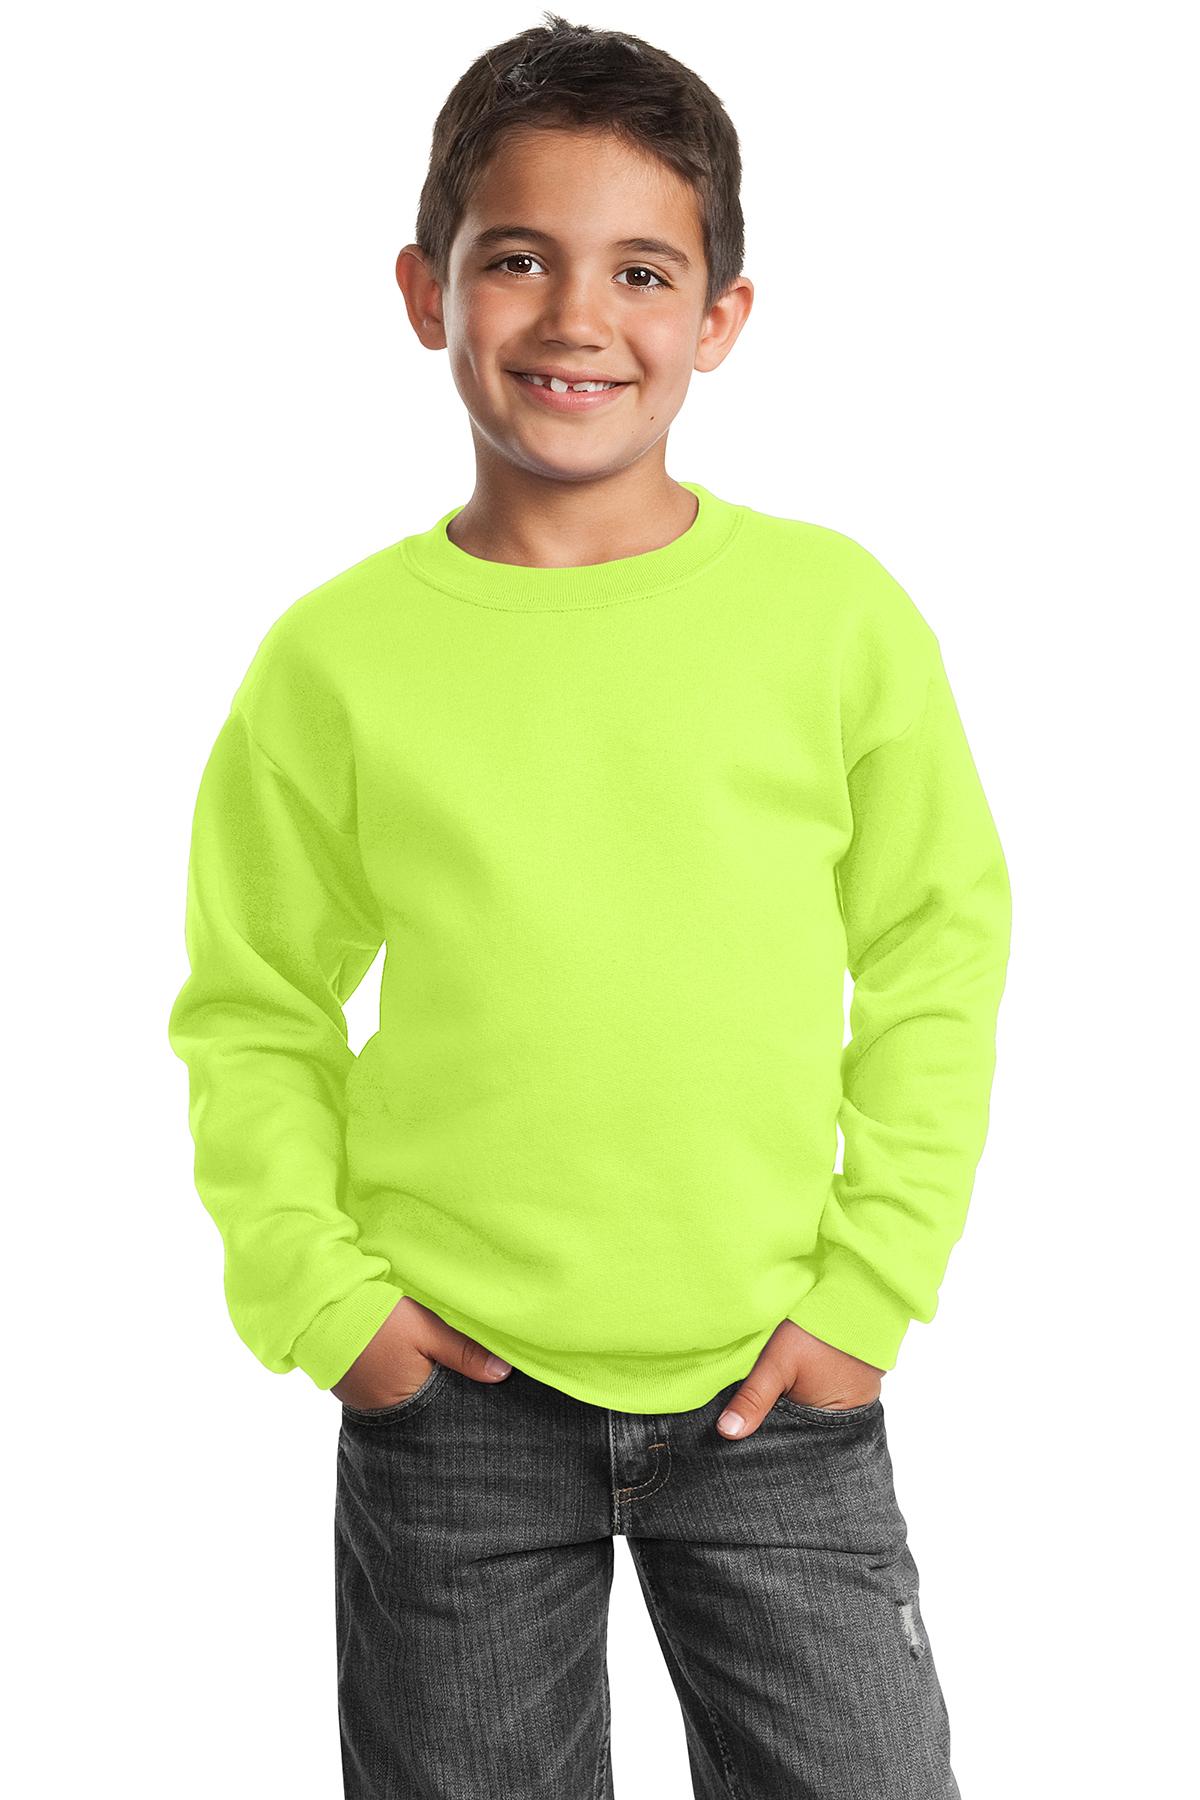 Youth Crewneck Sweatshirt Port /& Company Maroon X-Small PC90Y